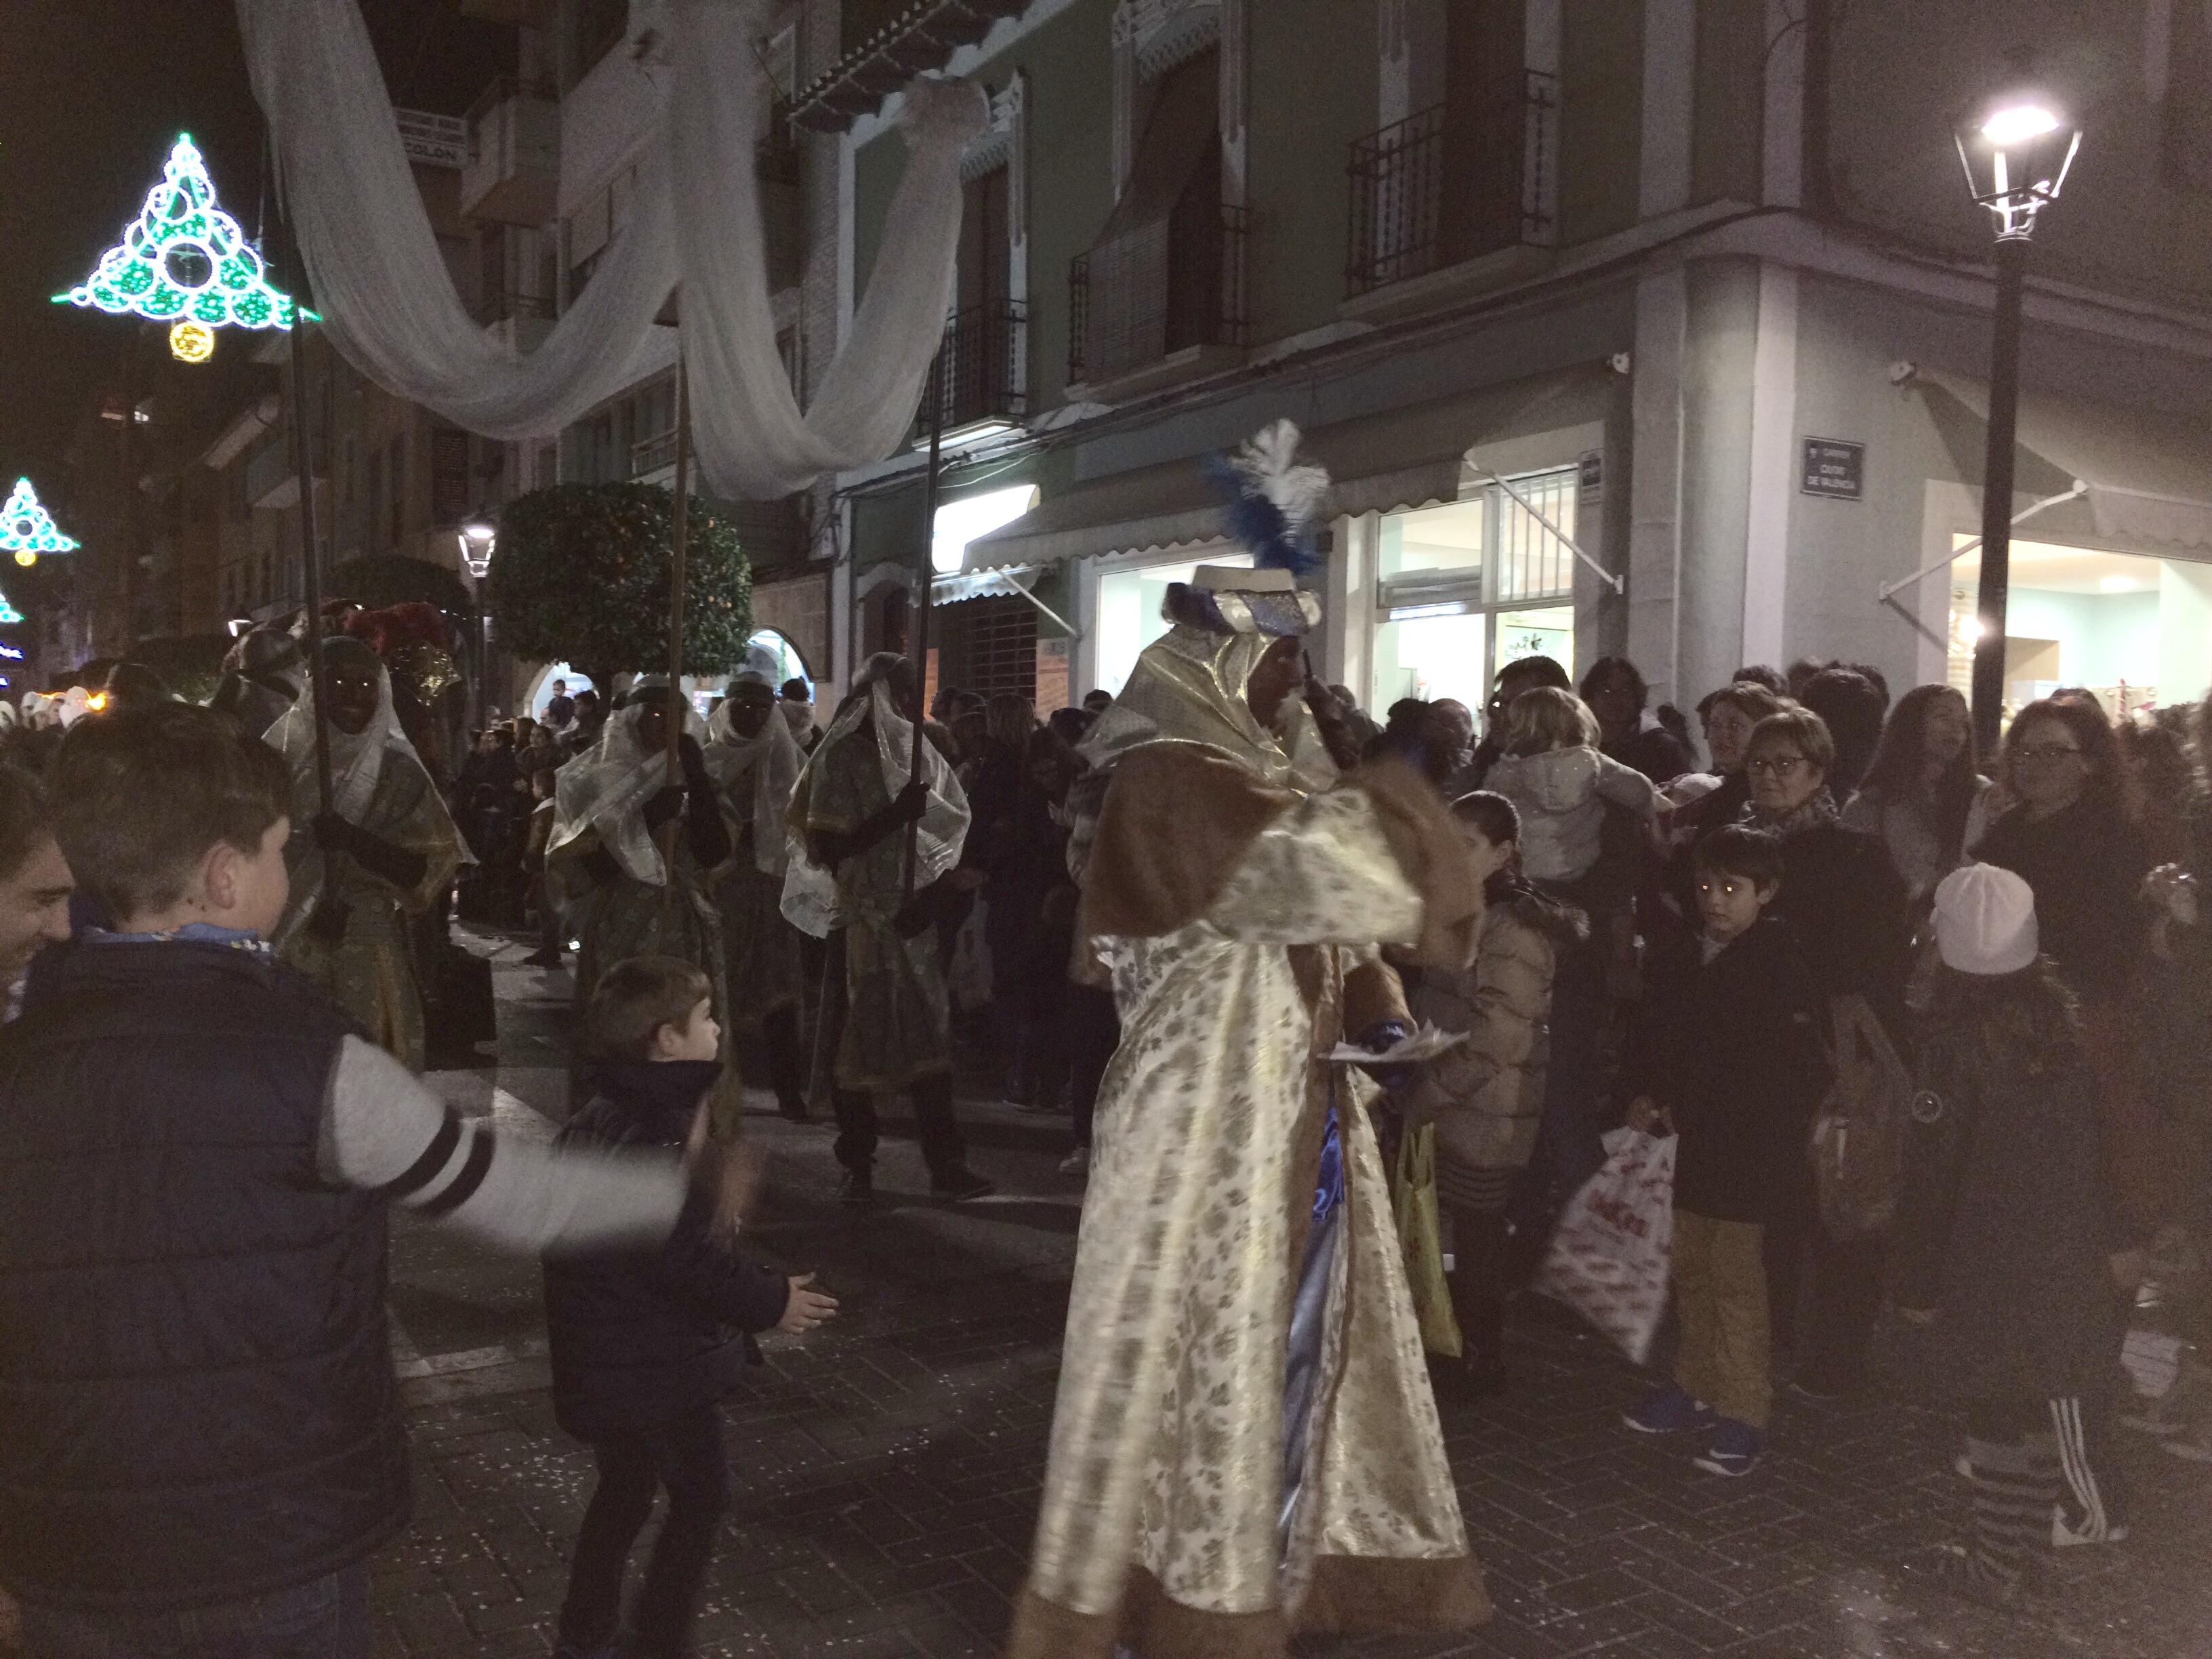 Three Kings parade - Vilajoysa Spain